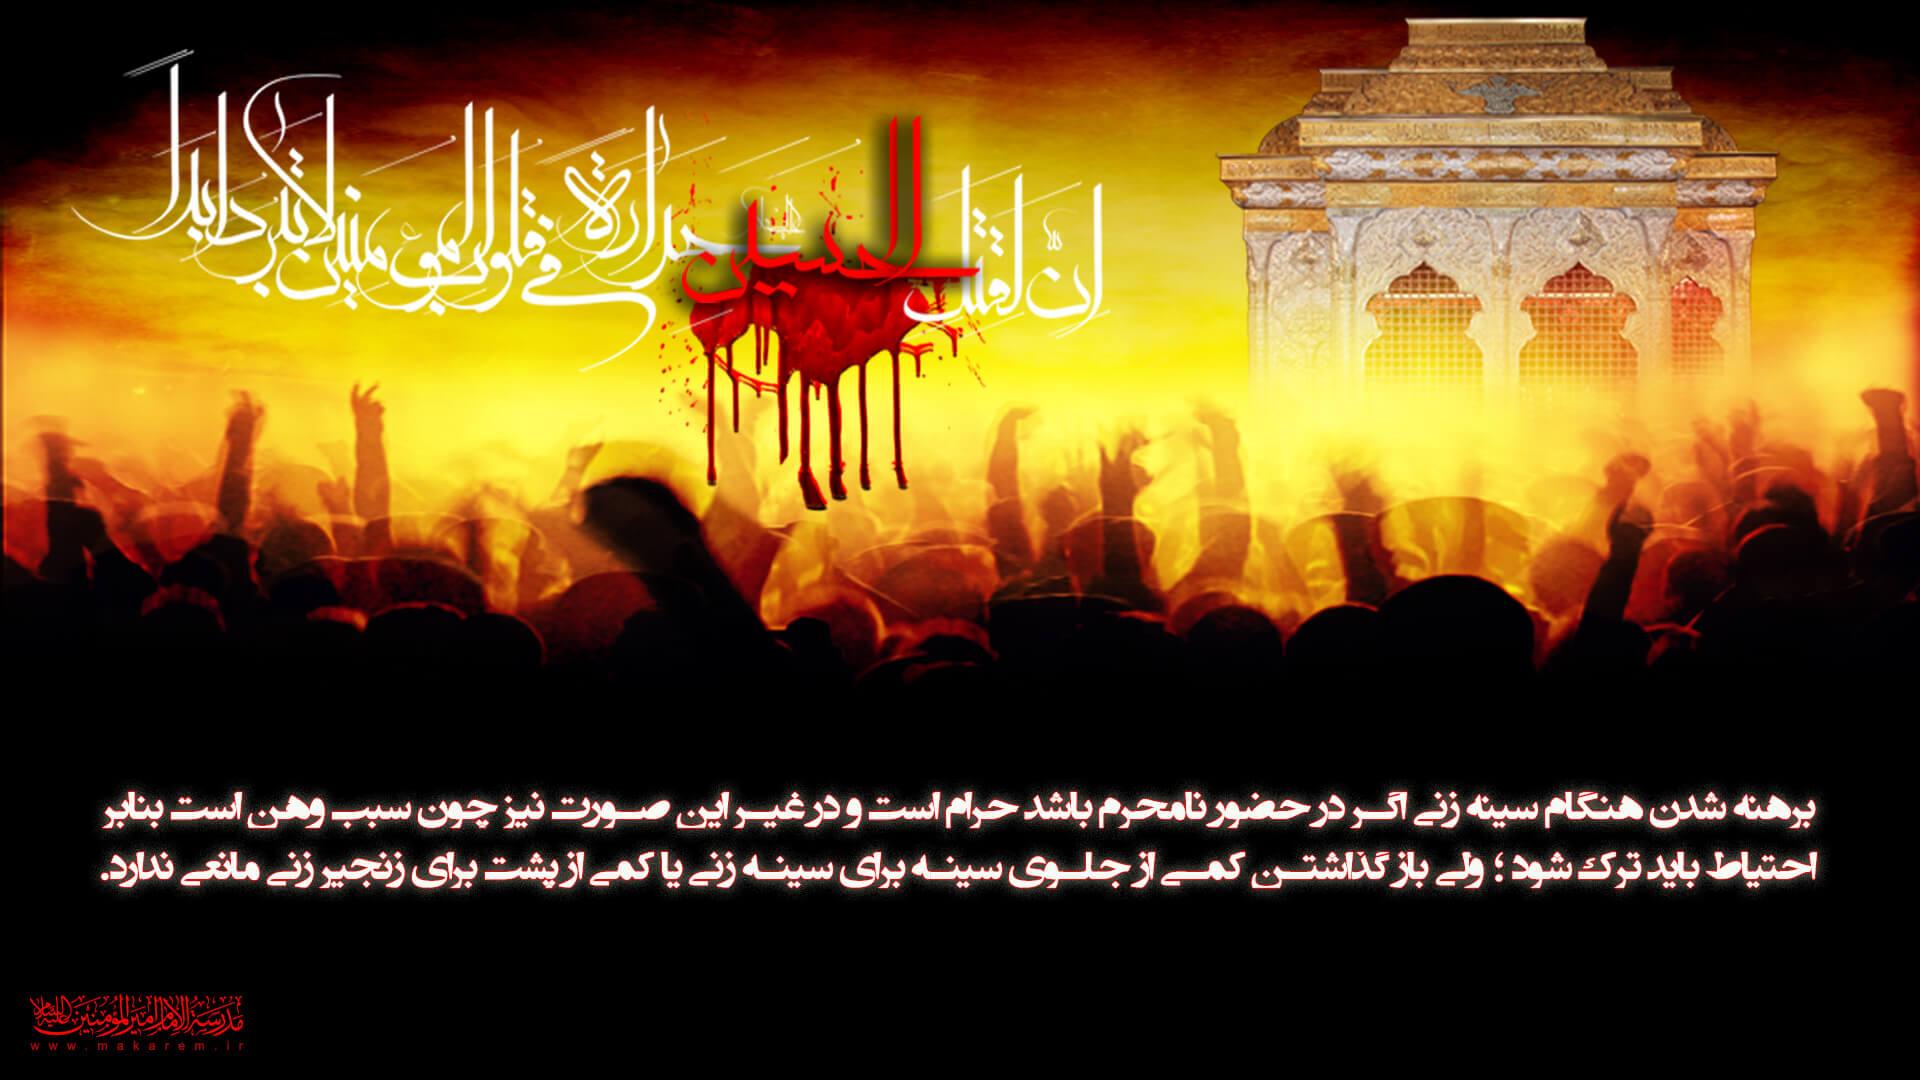 احکام عزاداری 05-مدرسه الامام امیر المومنین (ع)